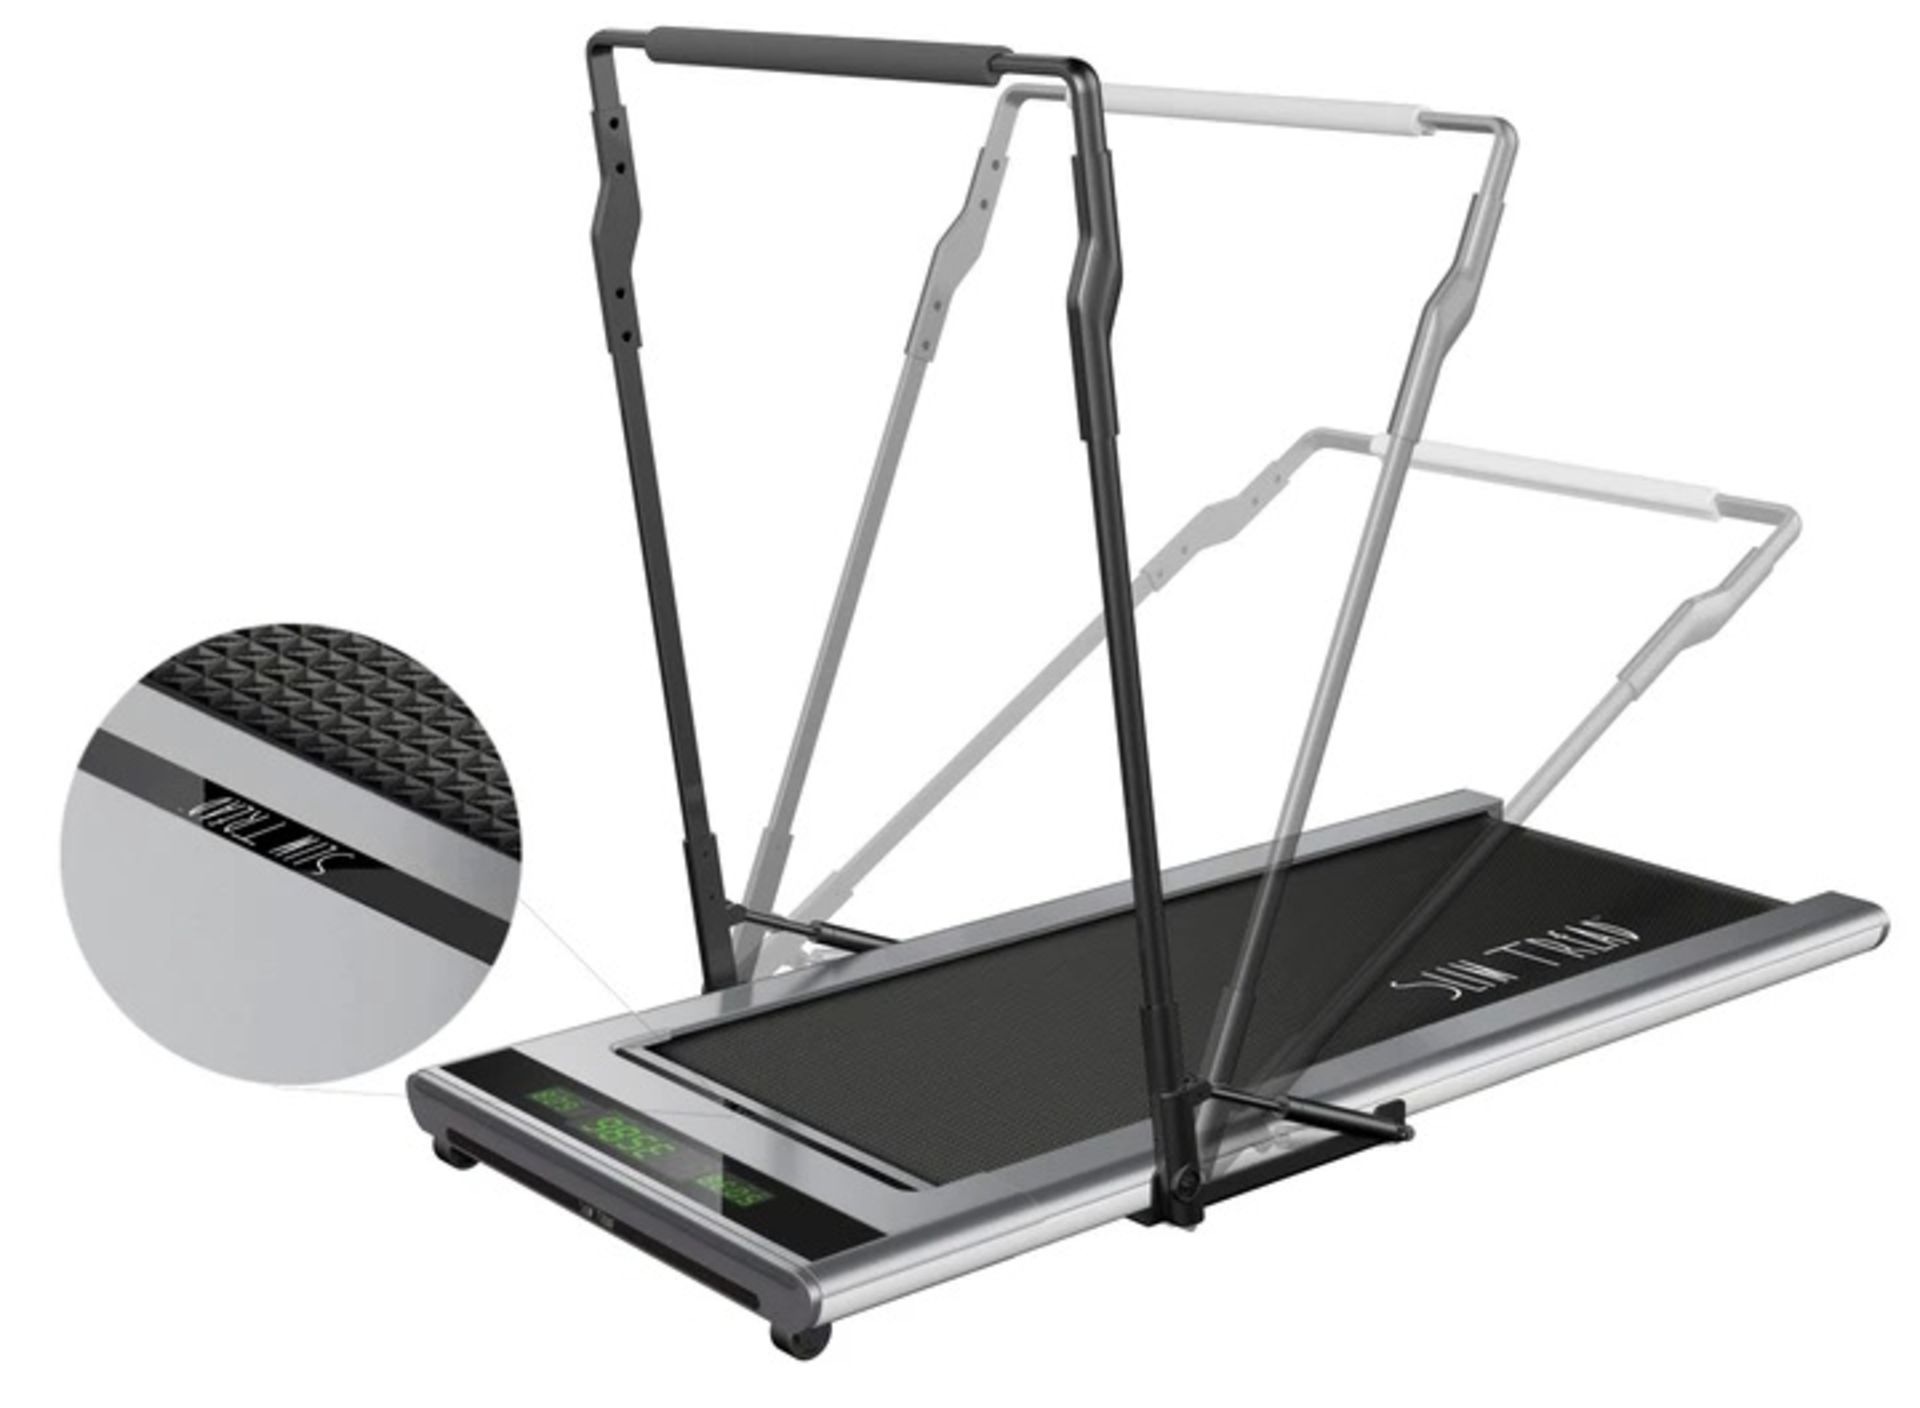 1 x Slim Tread Ultra Thin Smart Treadmill Running / Walking Machine - Lightweight With Folding - Image 15 of 19